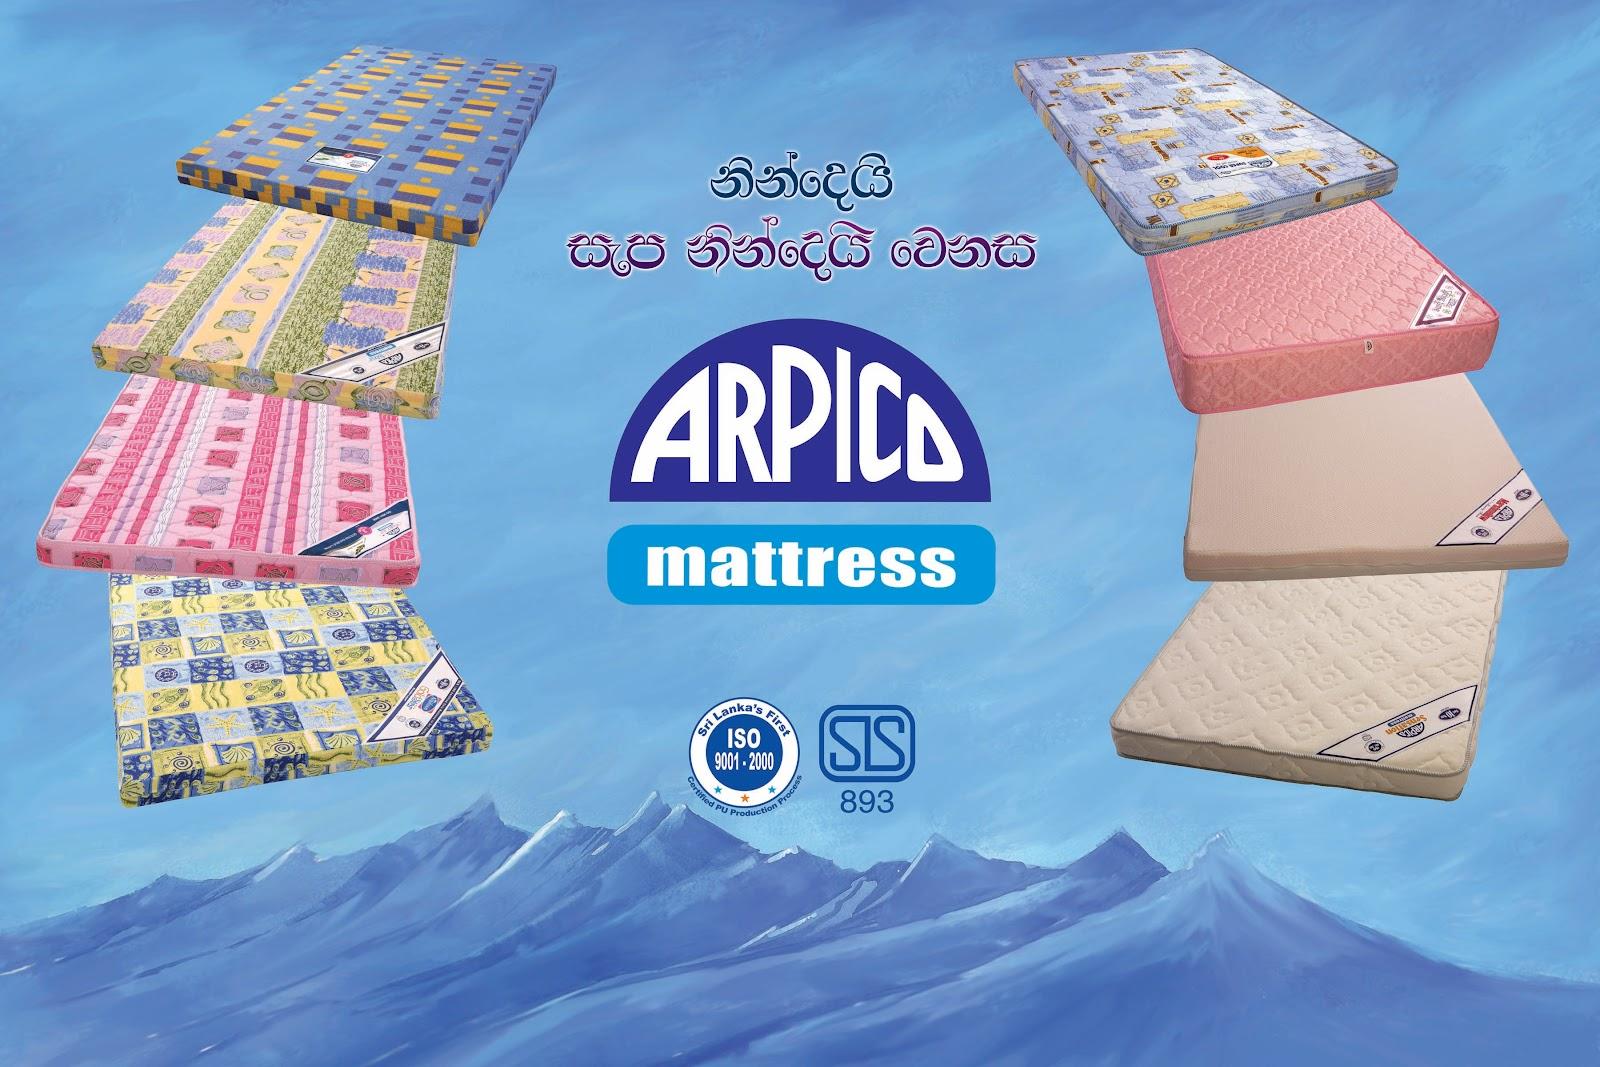 Arpico Mattress and PU FoamsSponge